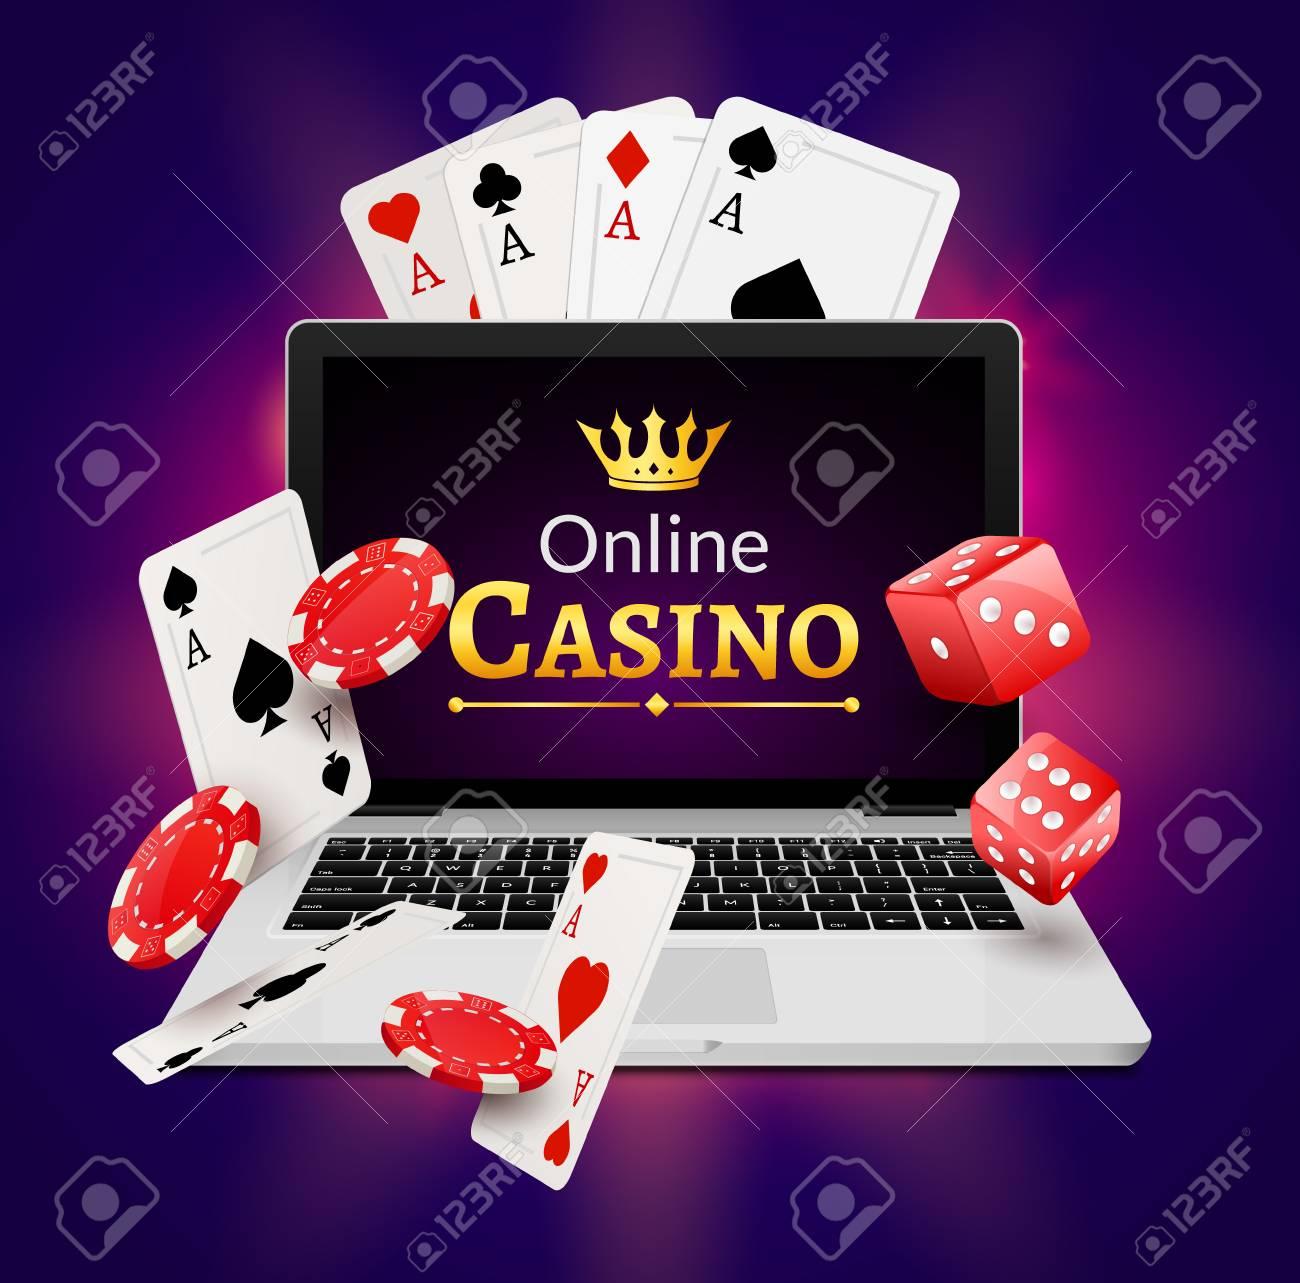 Concepto De Banner De Casino En Linea Con La Computadora Portatil